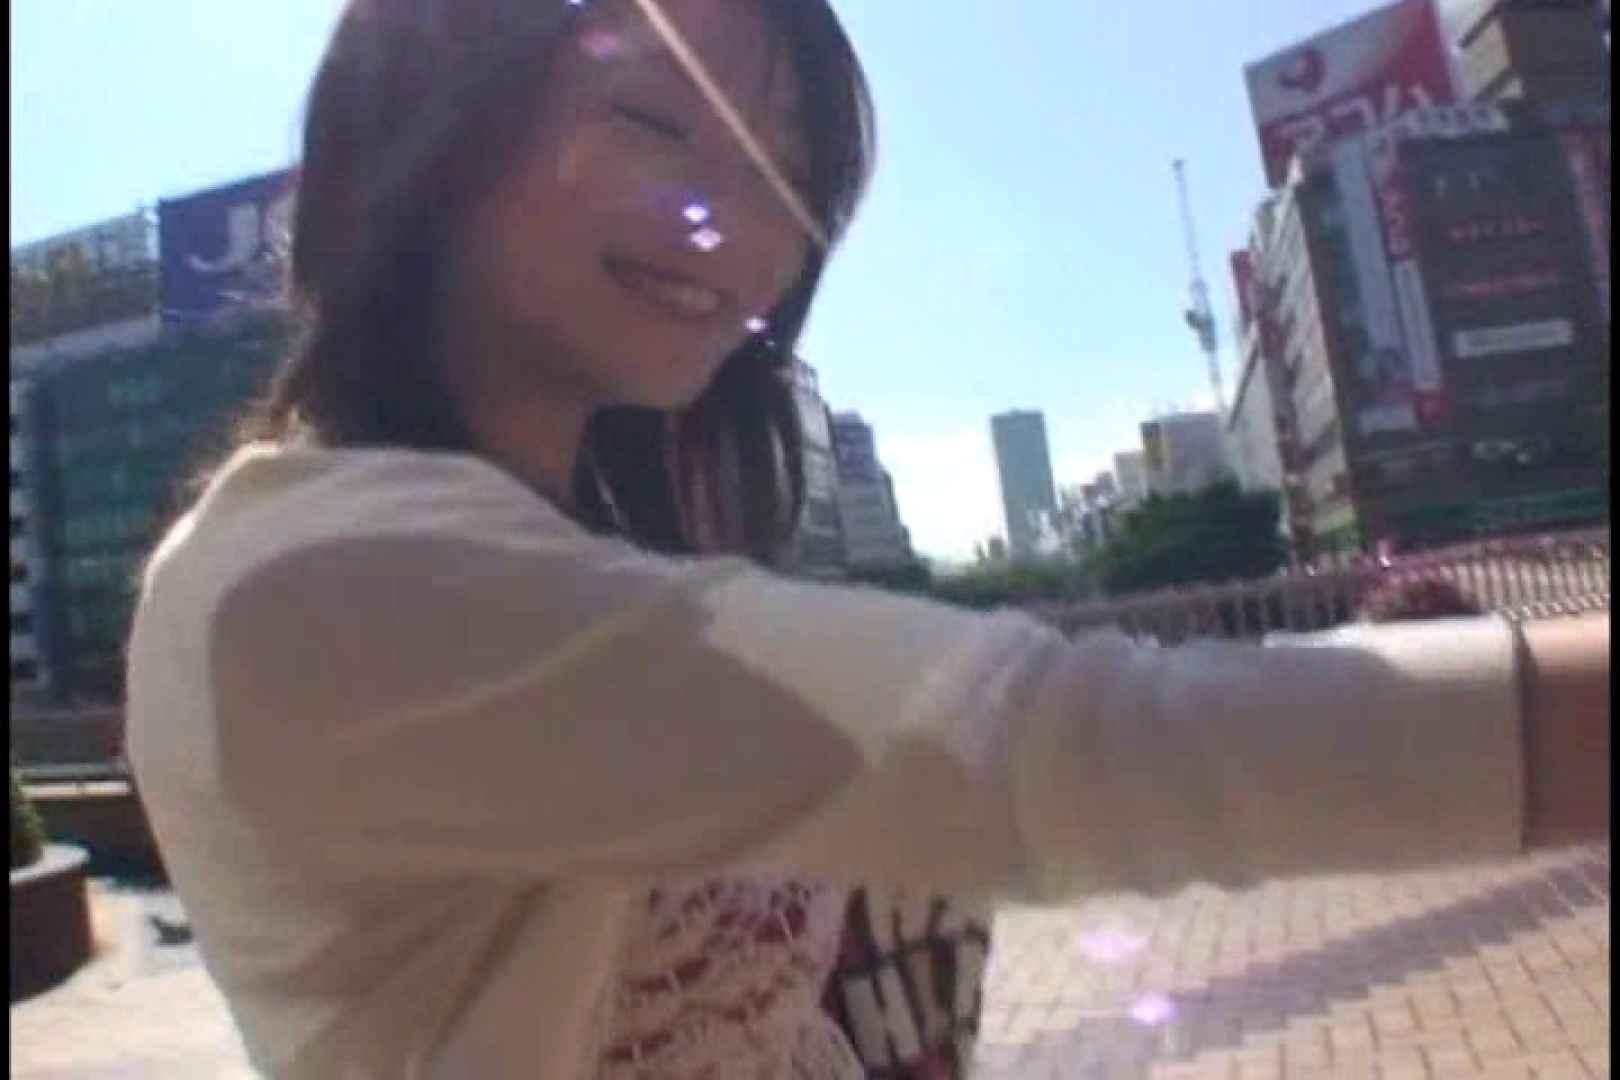 JDハンター全国ツアー vol.006 前編 超エロ女子大生  59枚 4